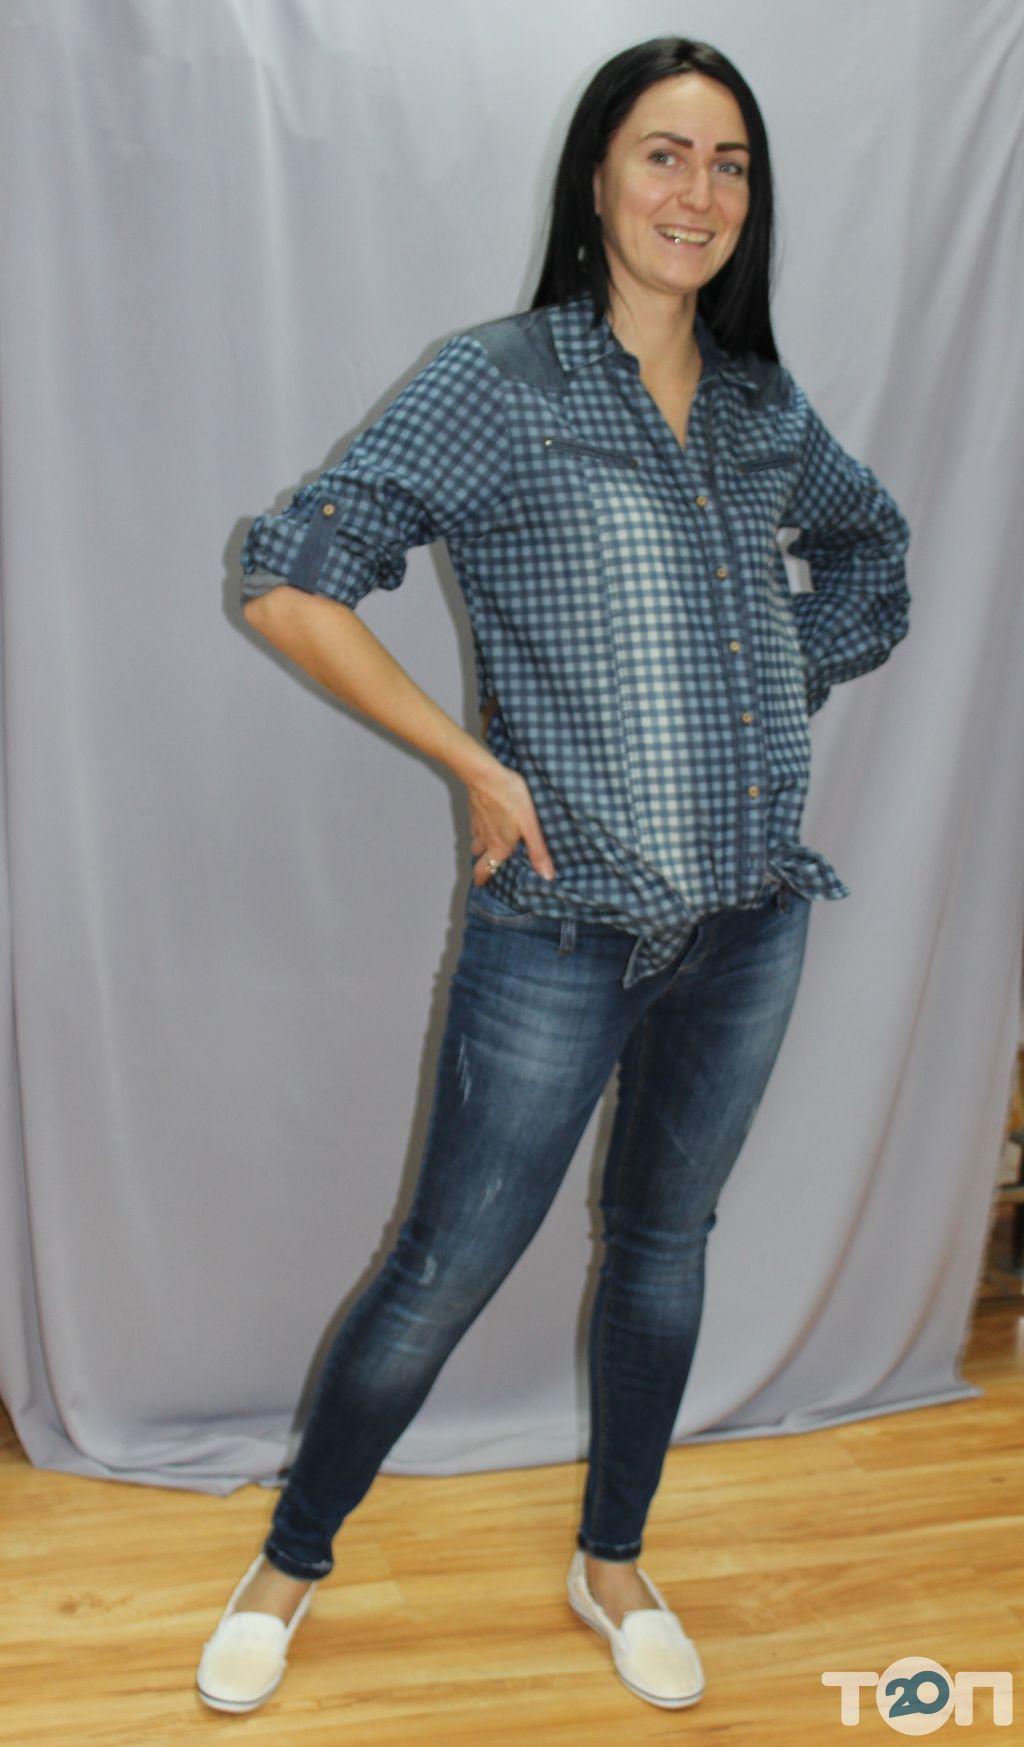 Дануся, одежда для беременных - фото 29